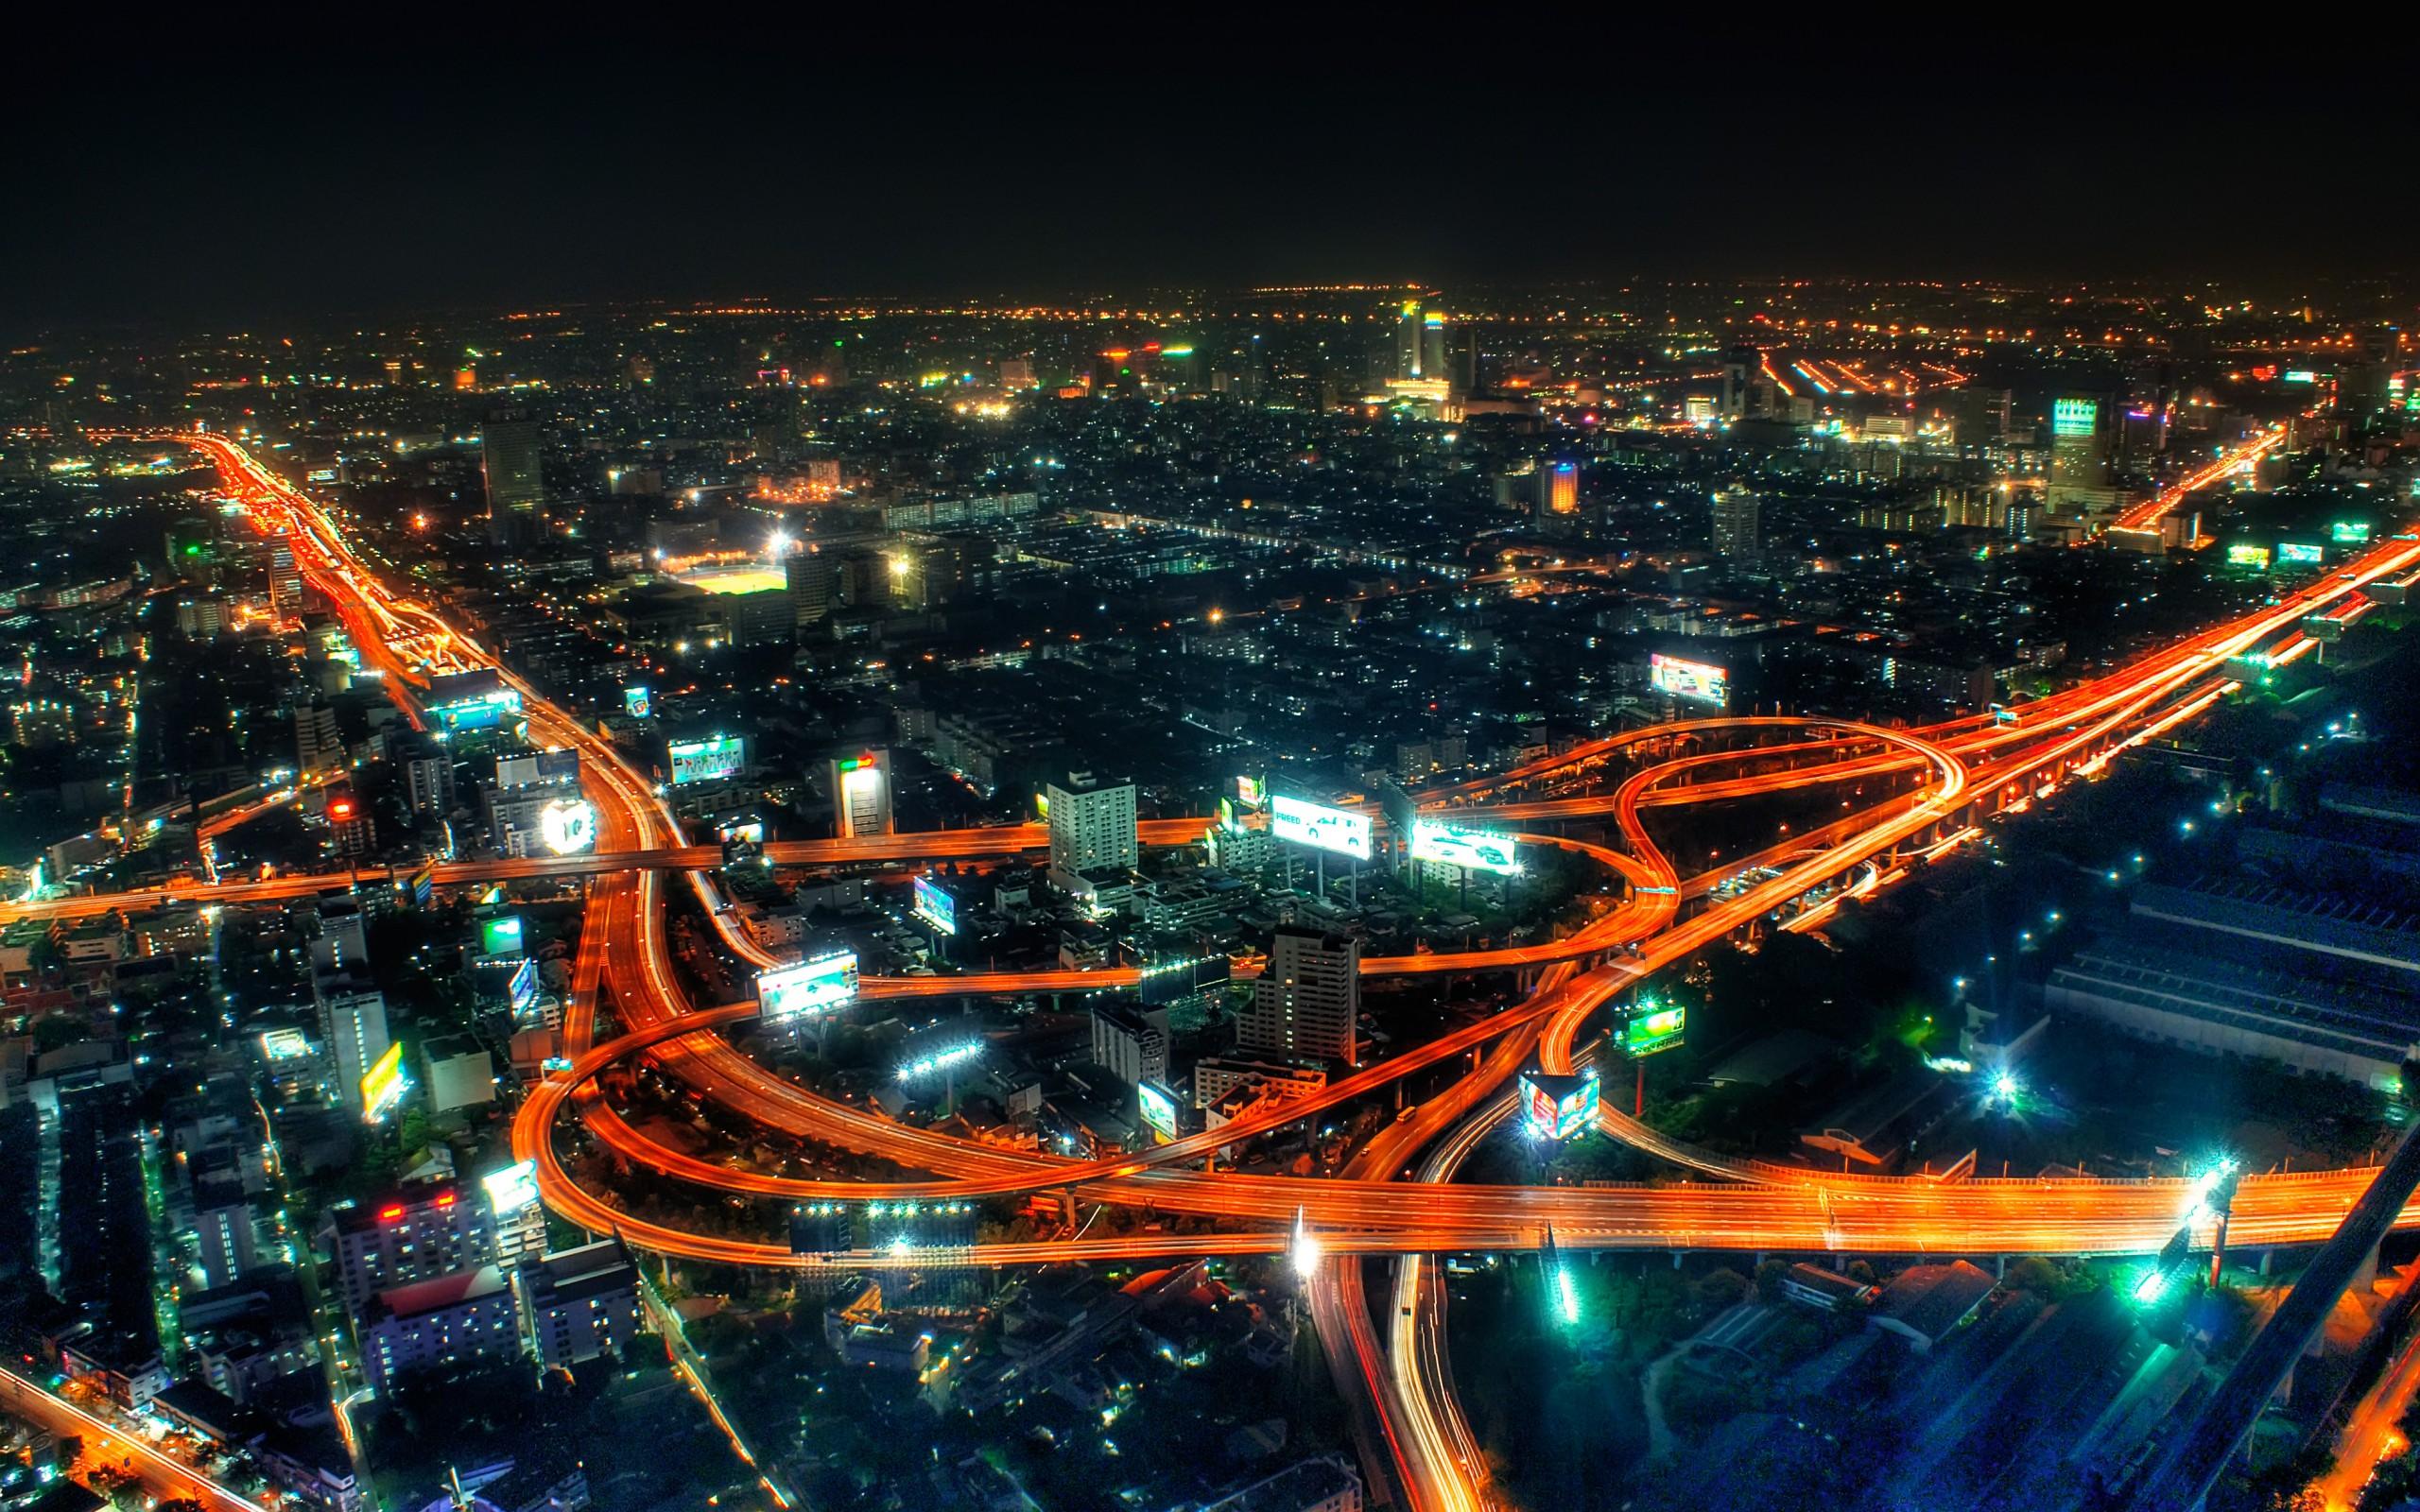 City life at night wallpapers City life at night stock photos 2560x1600